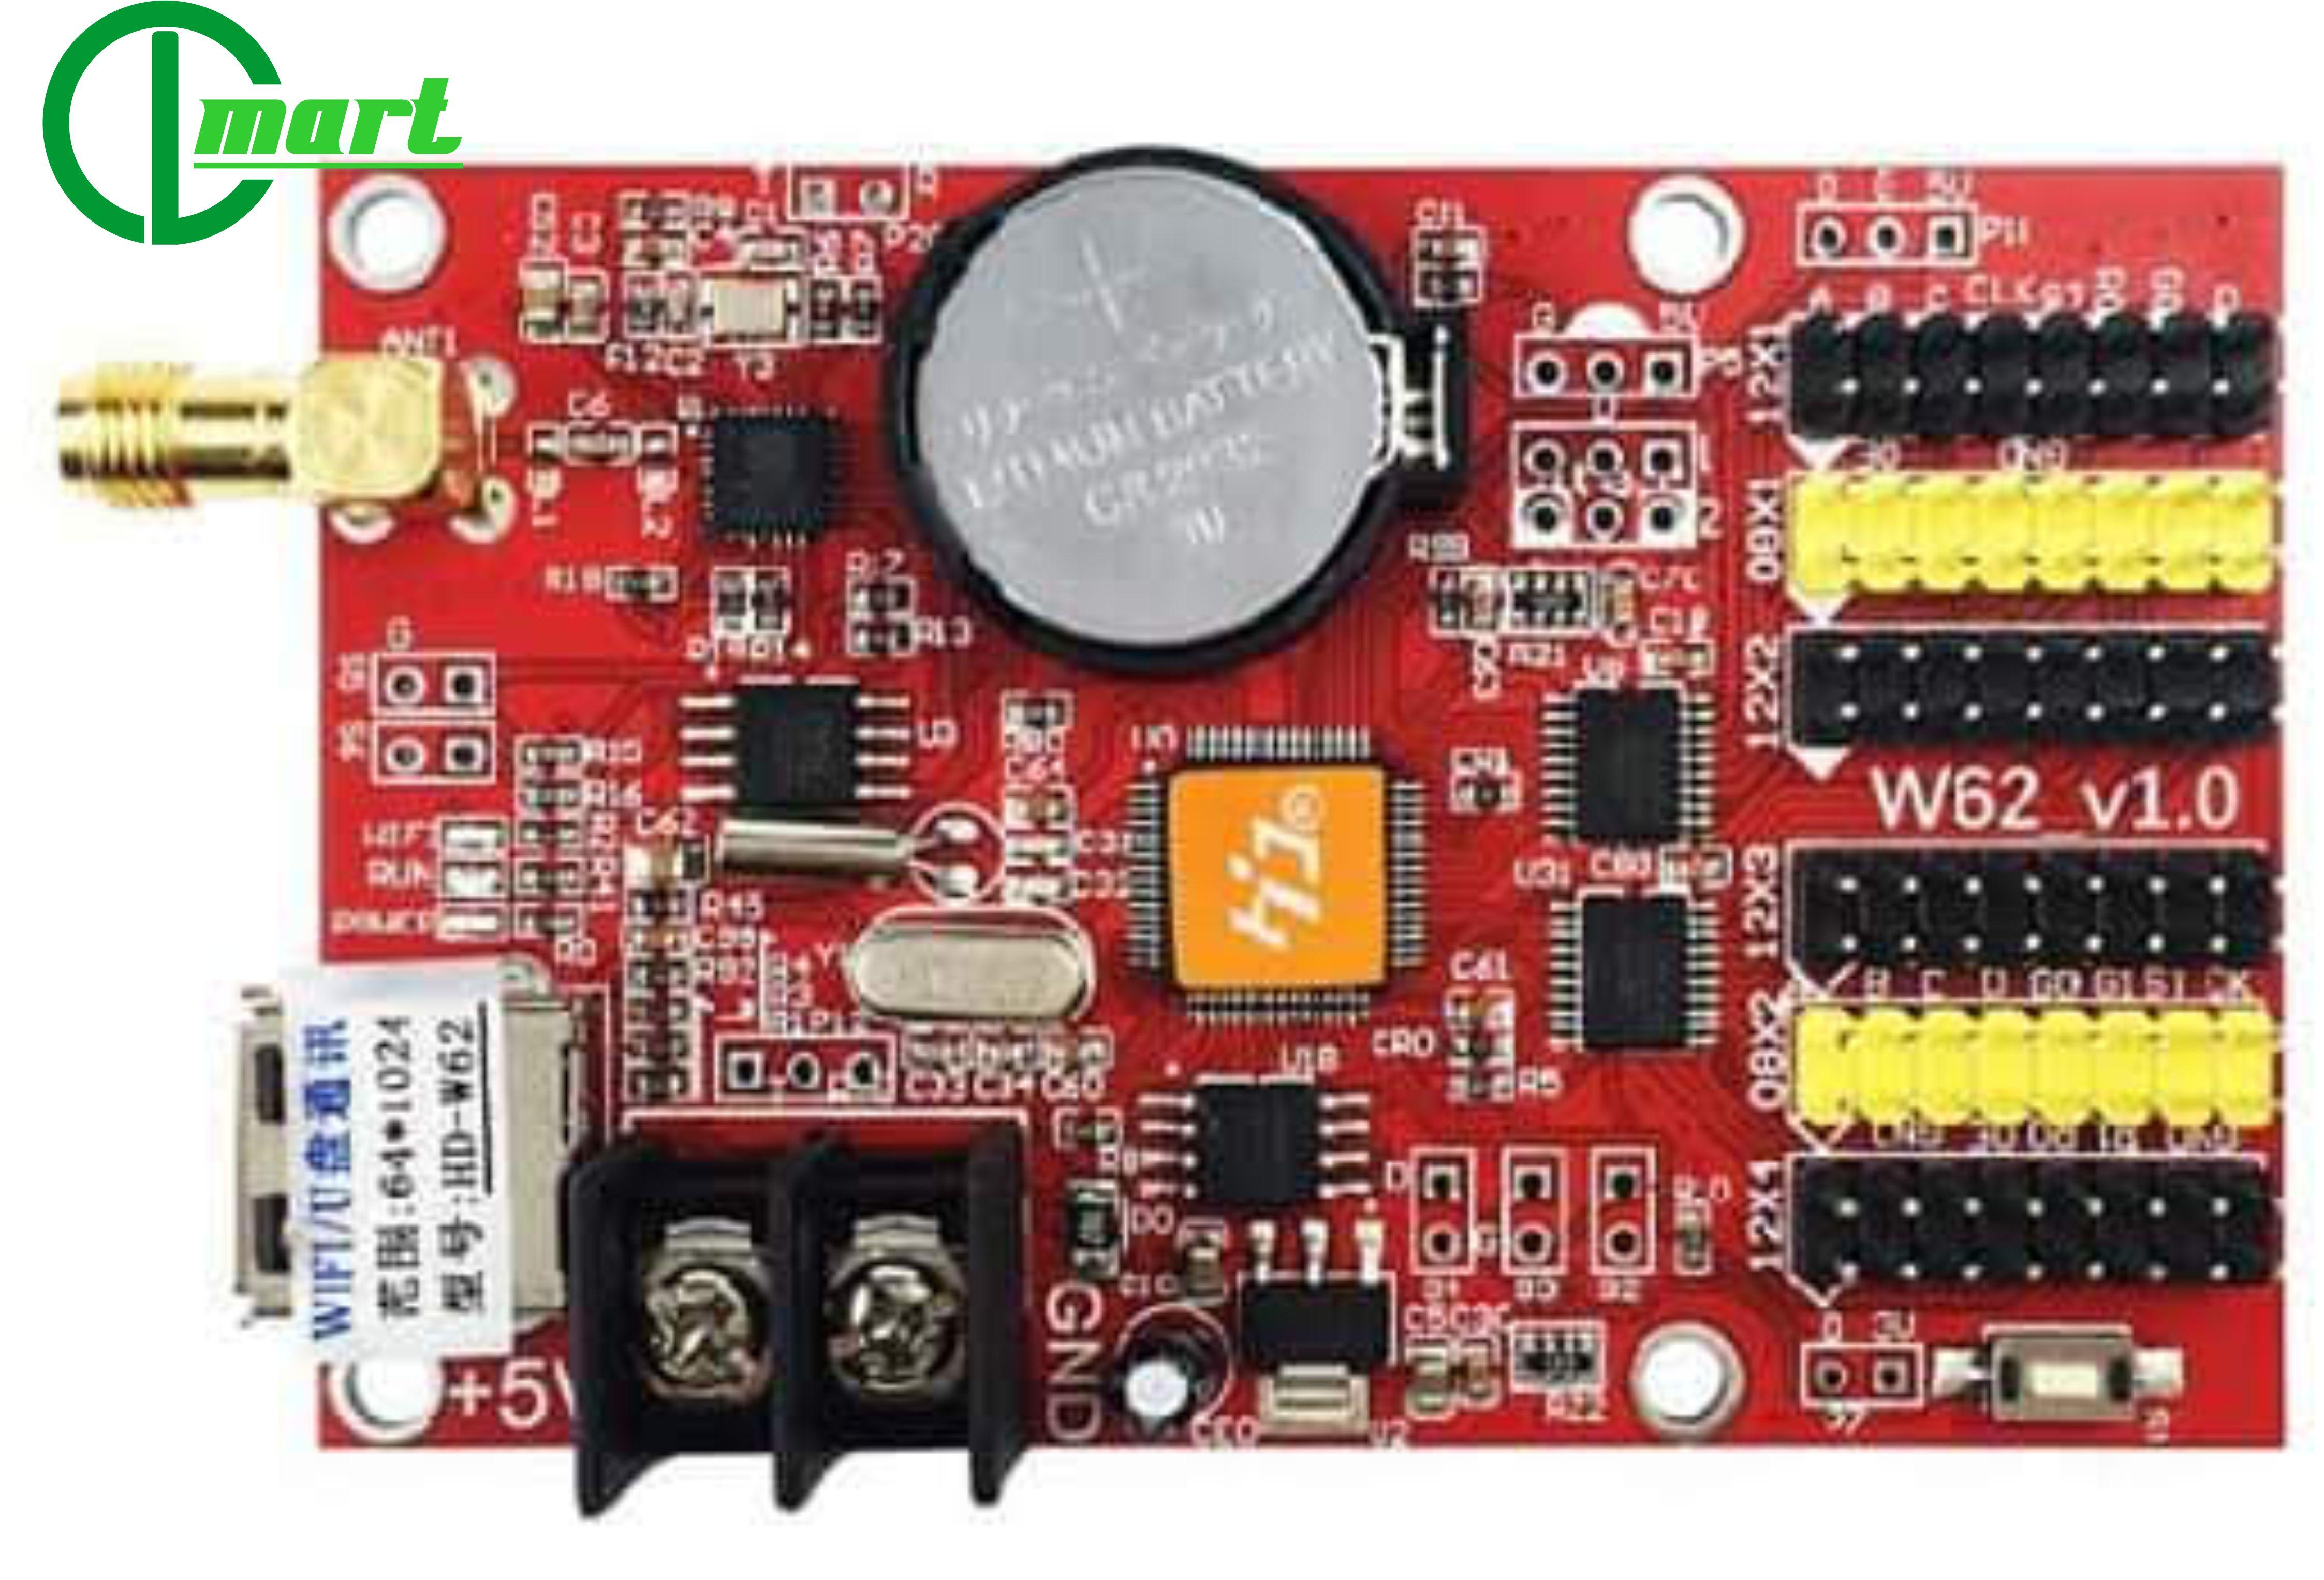 card-dieu-khien-led-ma-tran-hd-w62-wifi-usb